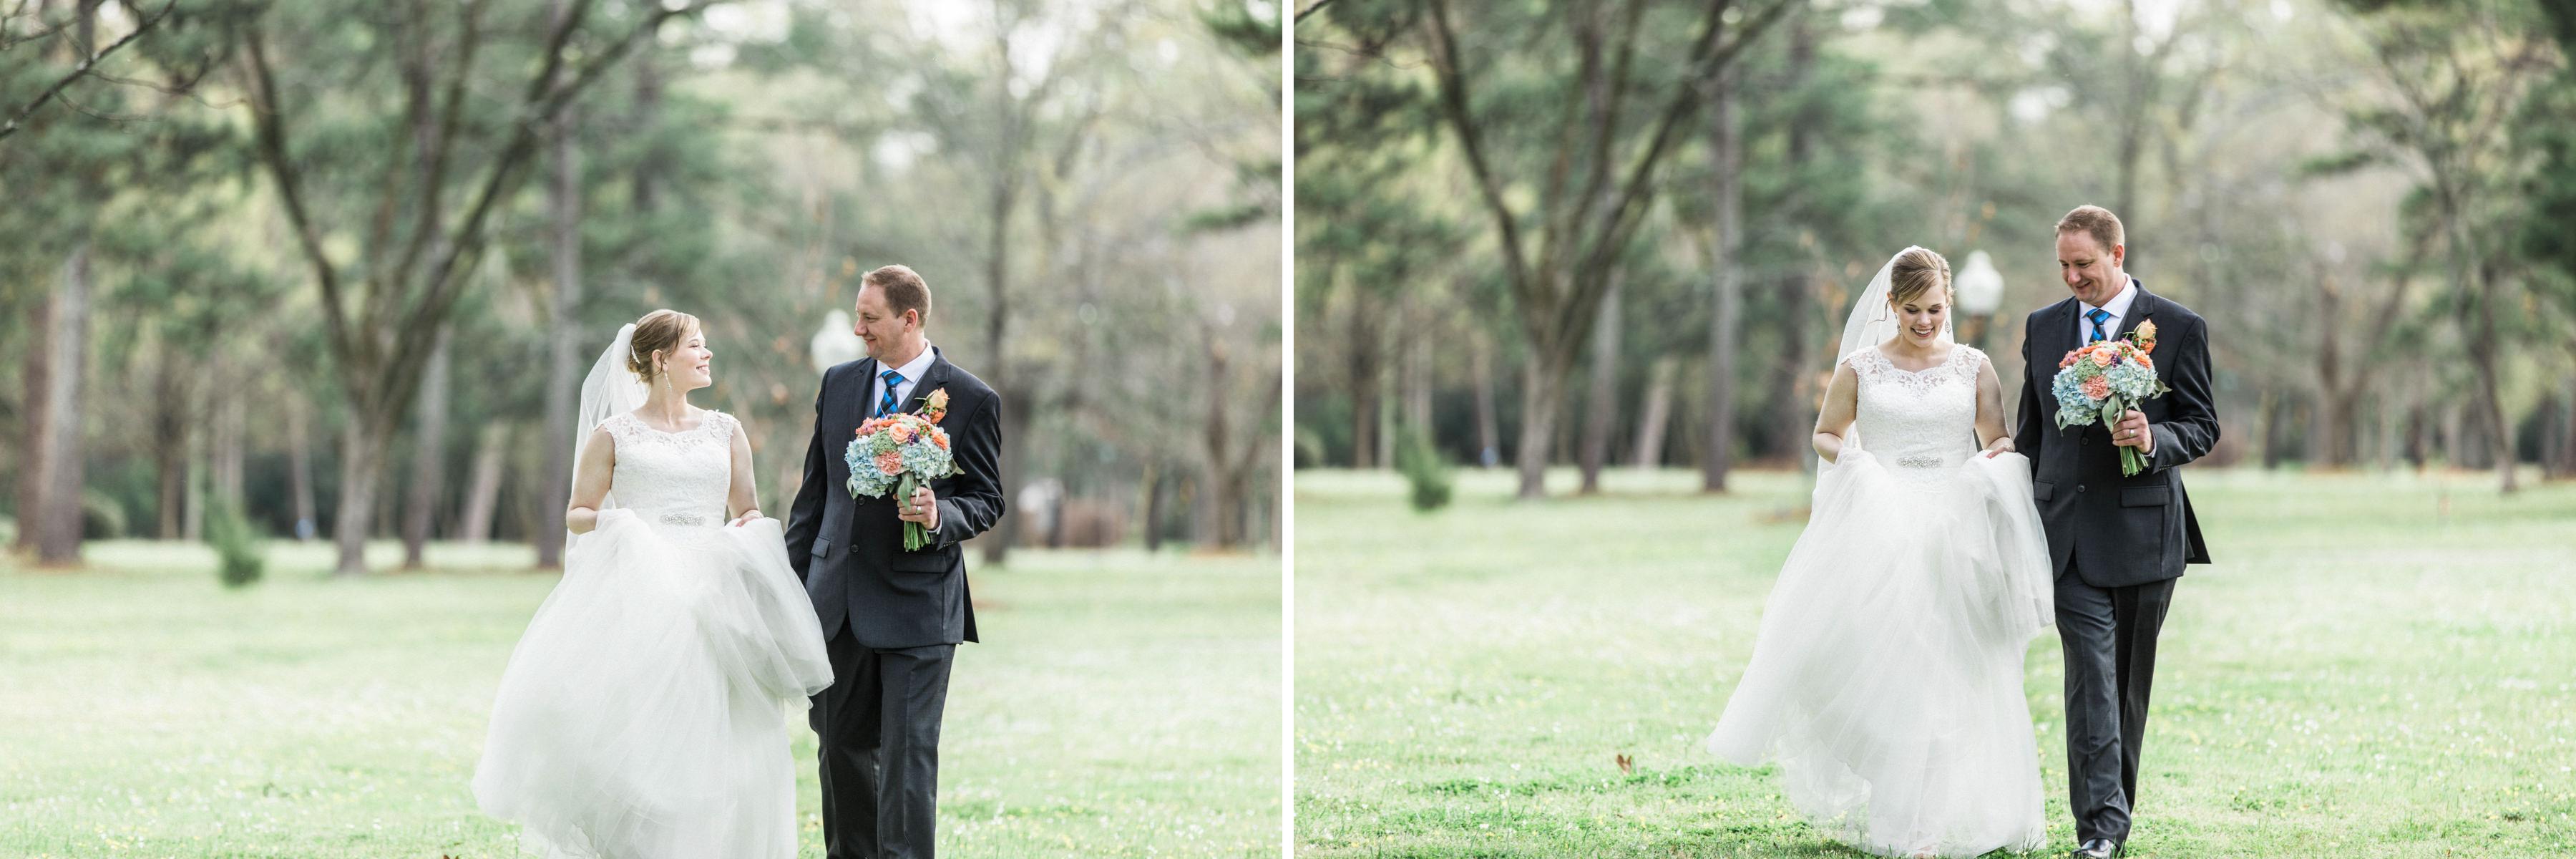 MAULDIN_WEDDING_MONTGOMERY_ALABAMA_WEDDING_PHOTOGRAPHY_81